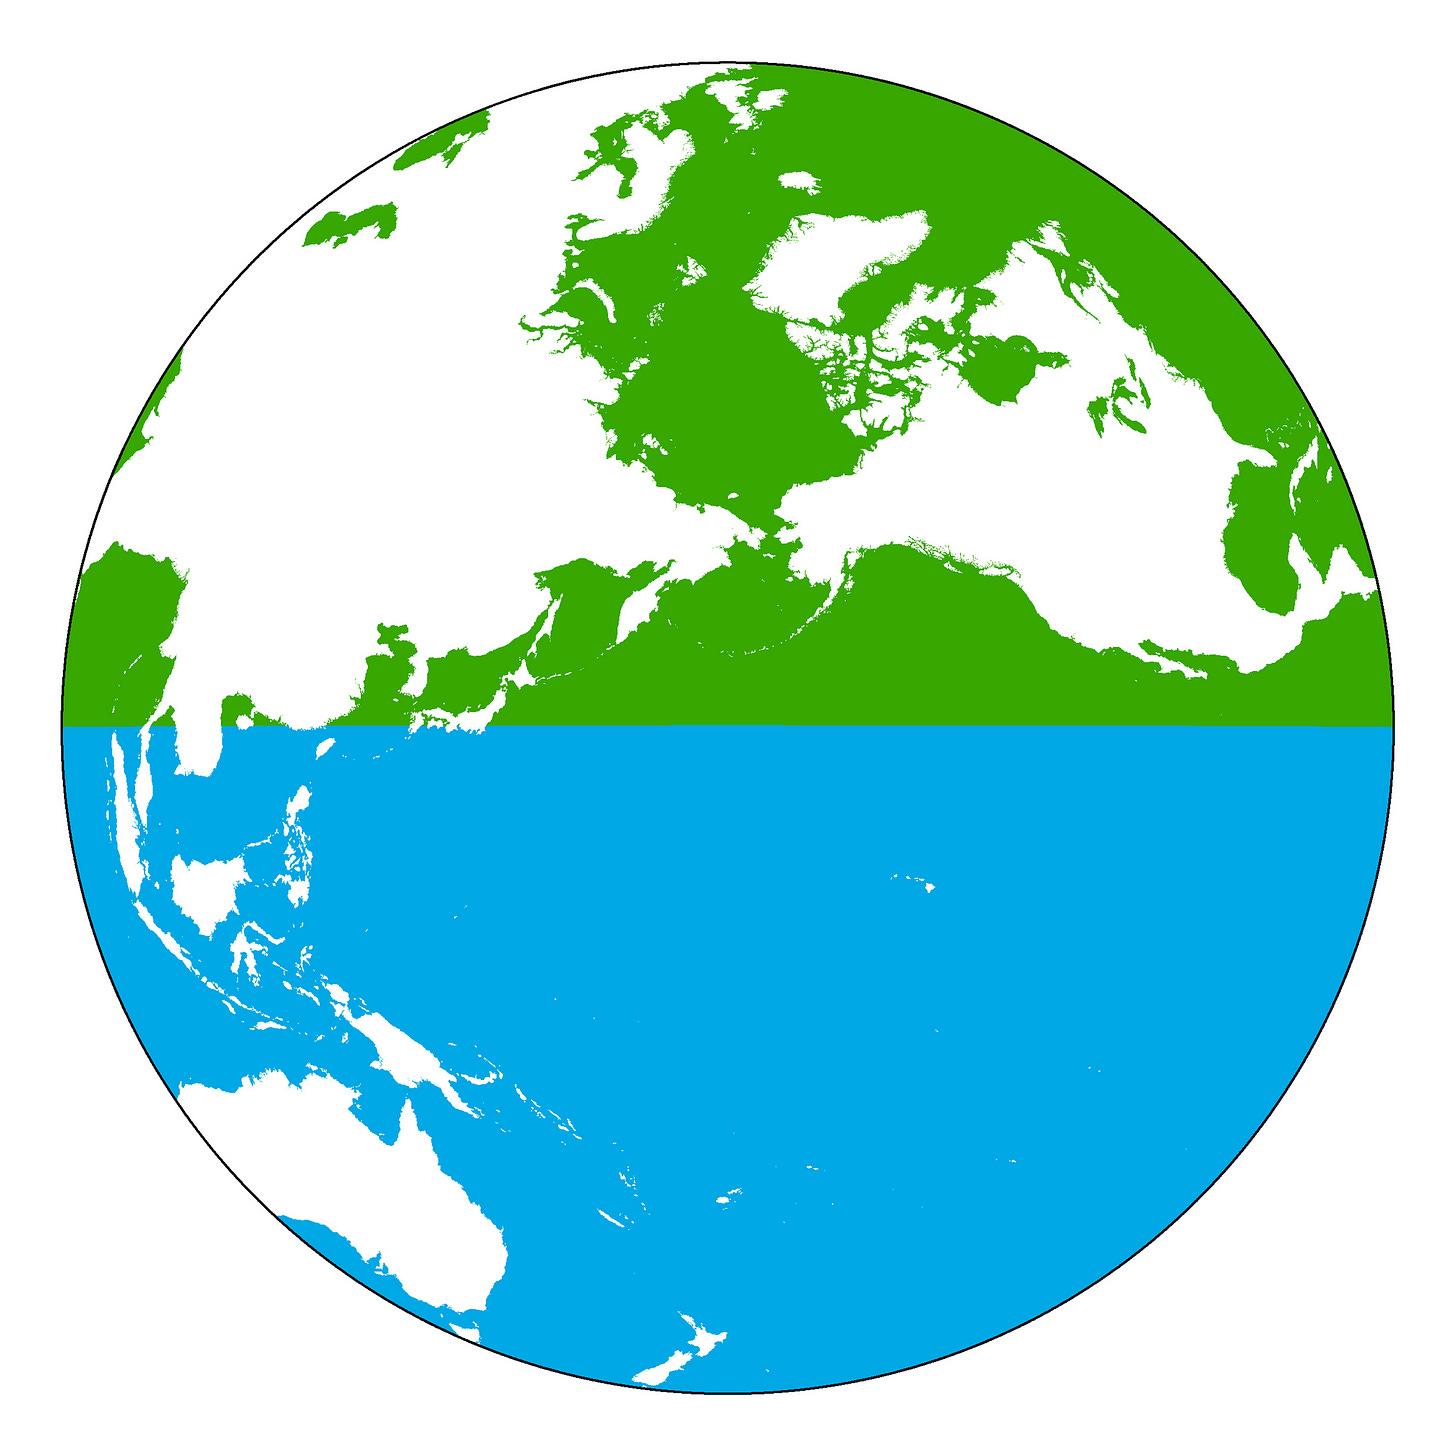 Land Hemisphere top, Water Hemisphere bottom